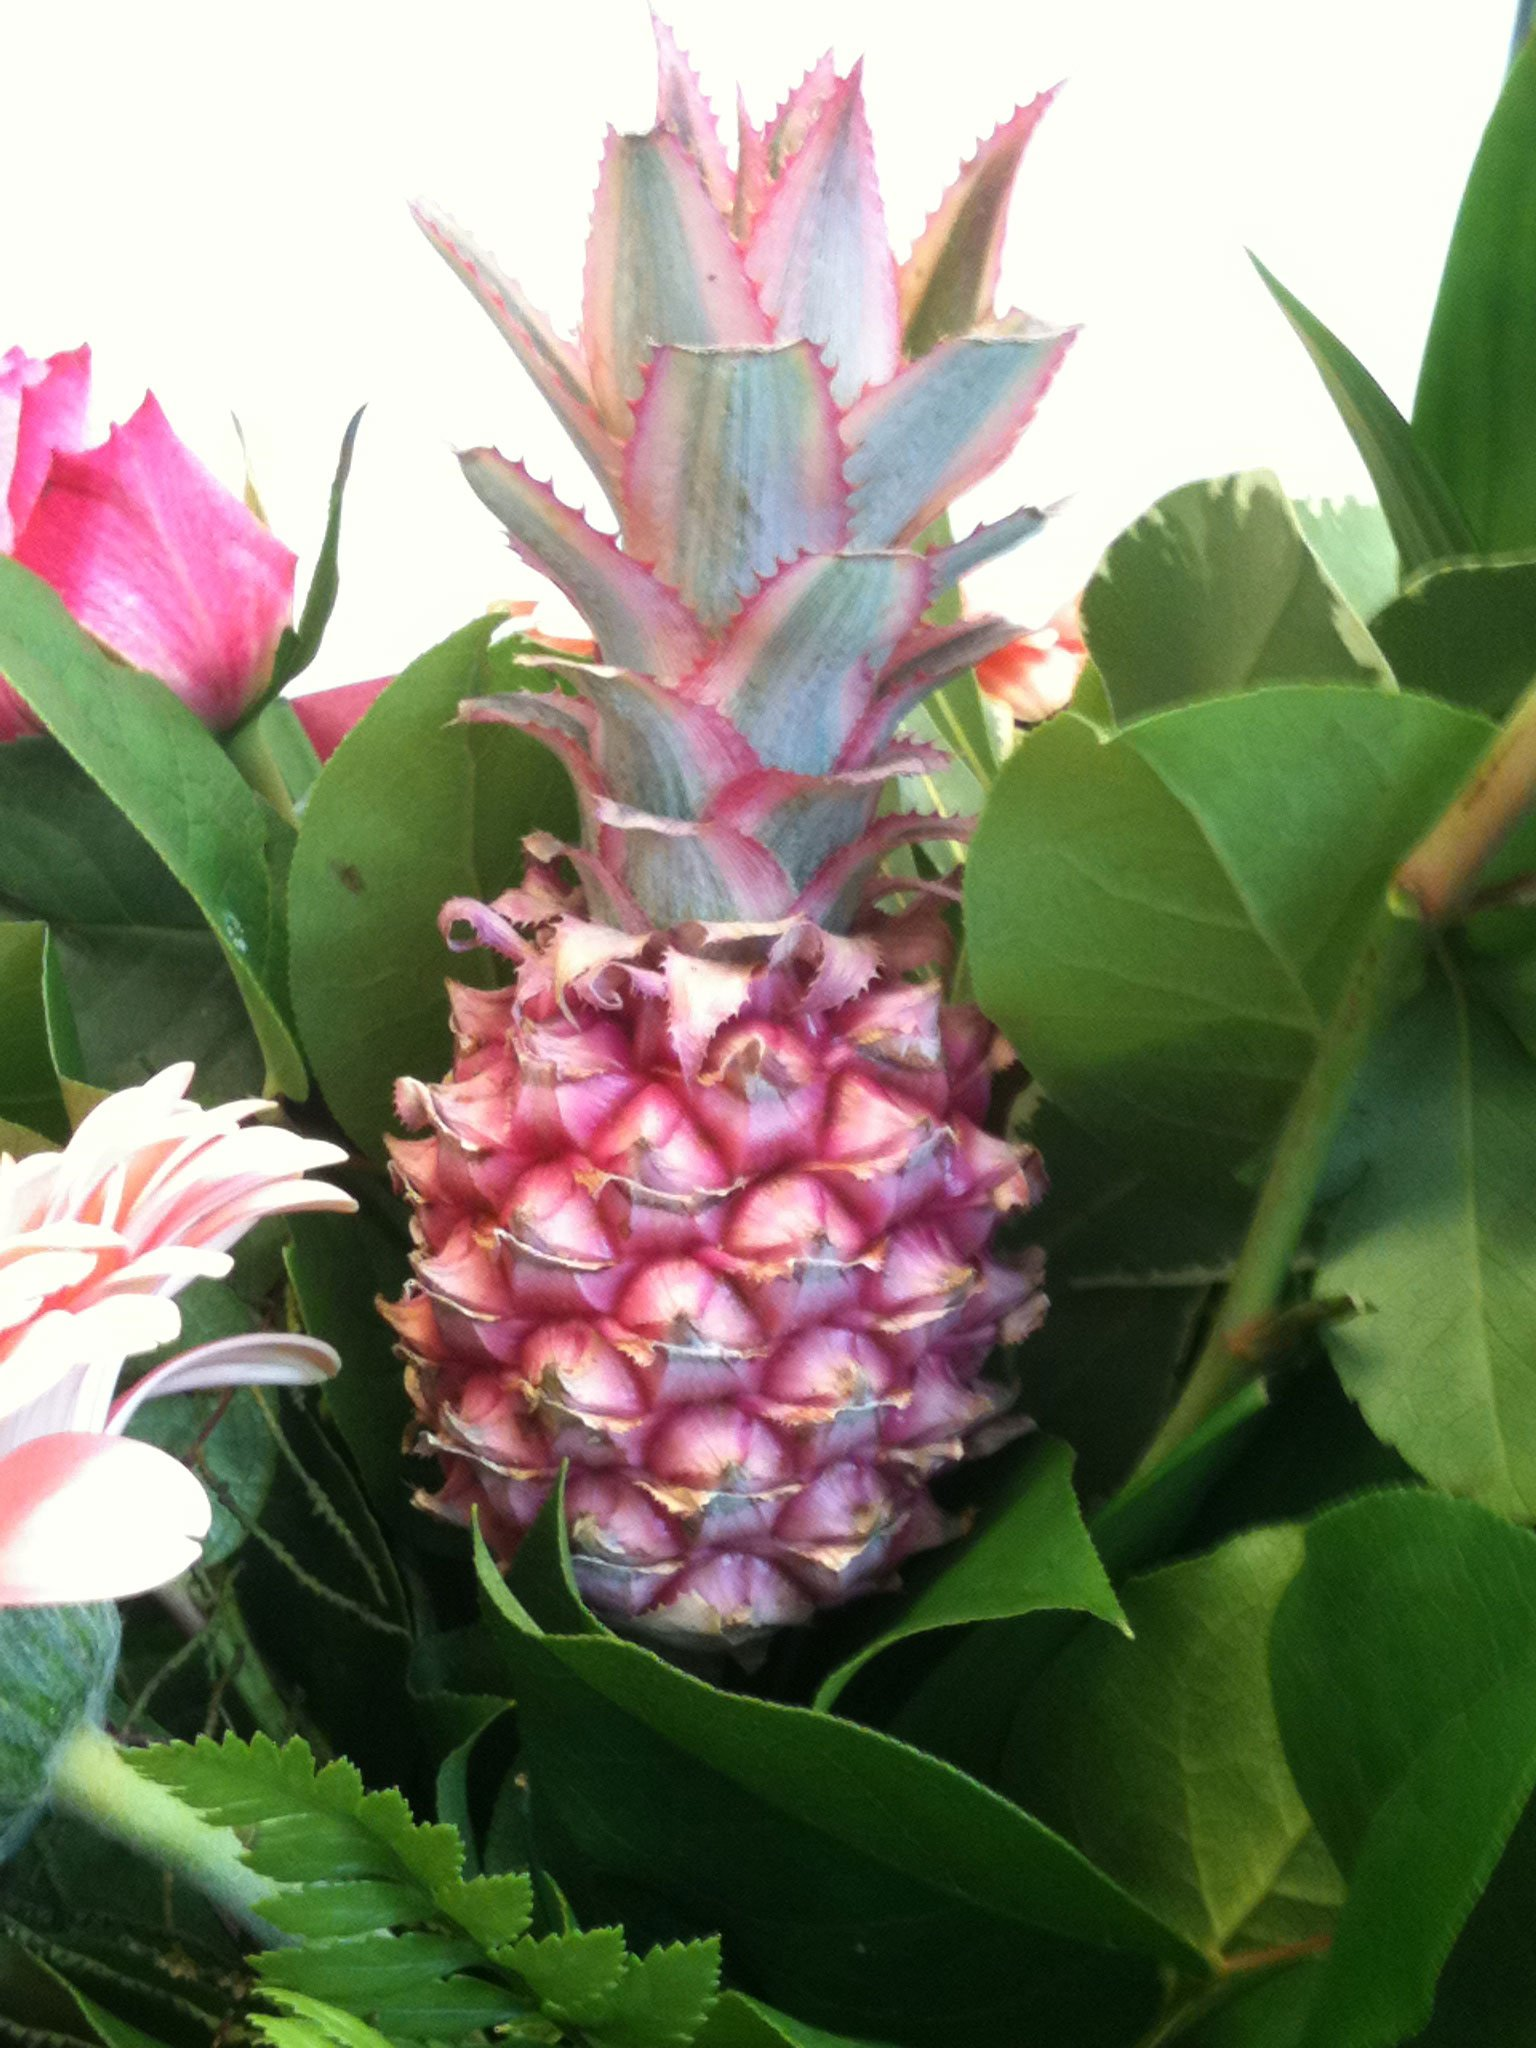 Pflanzen als Dekorationselement